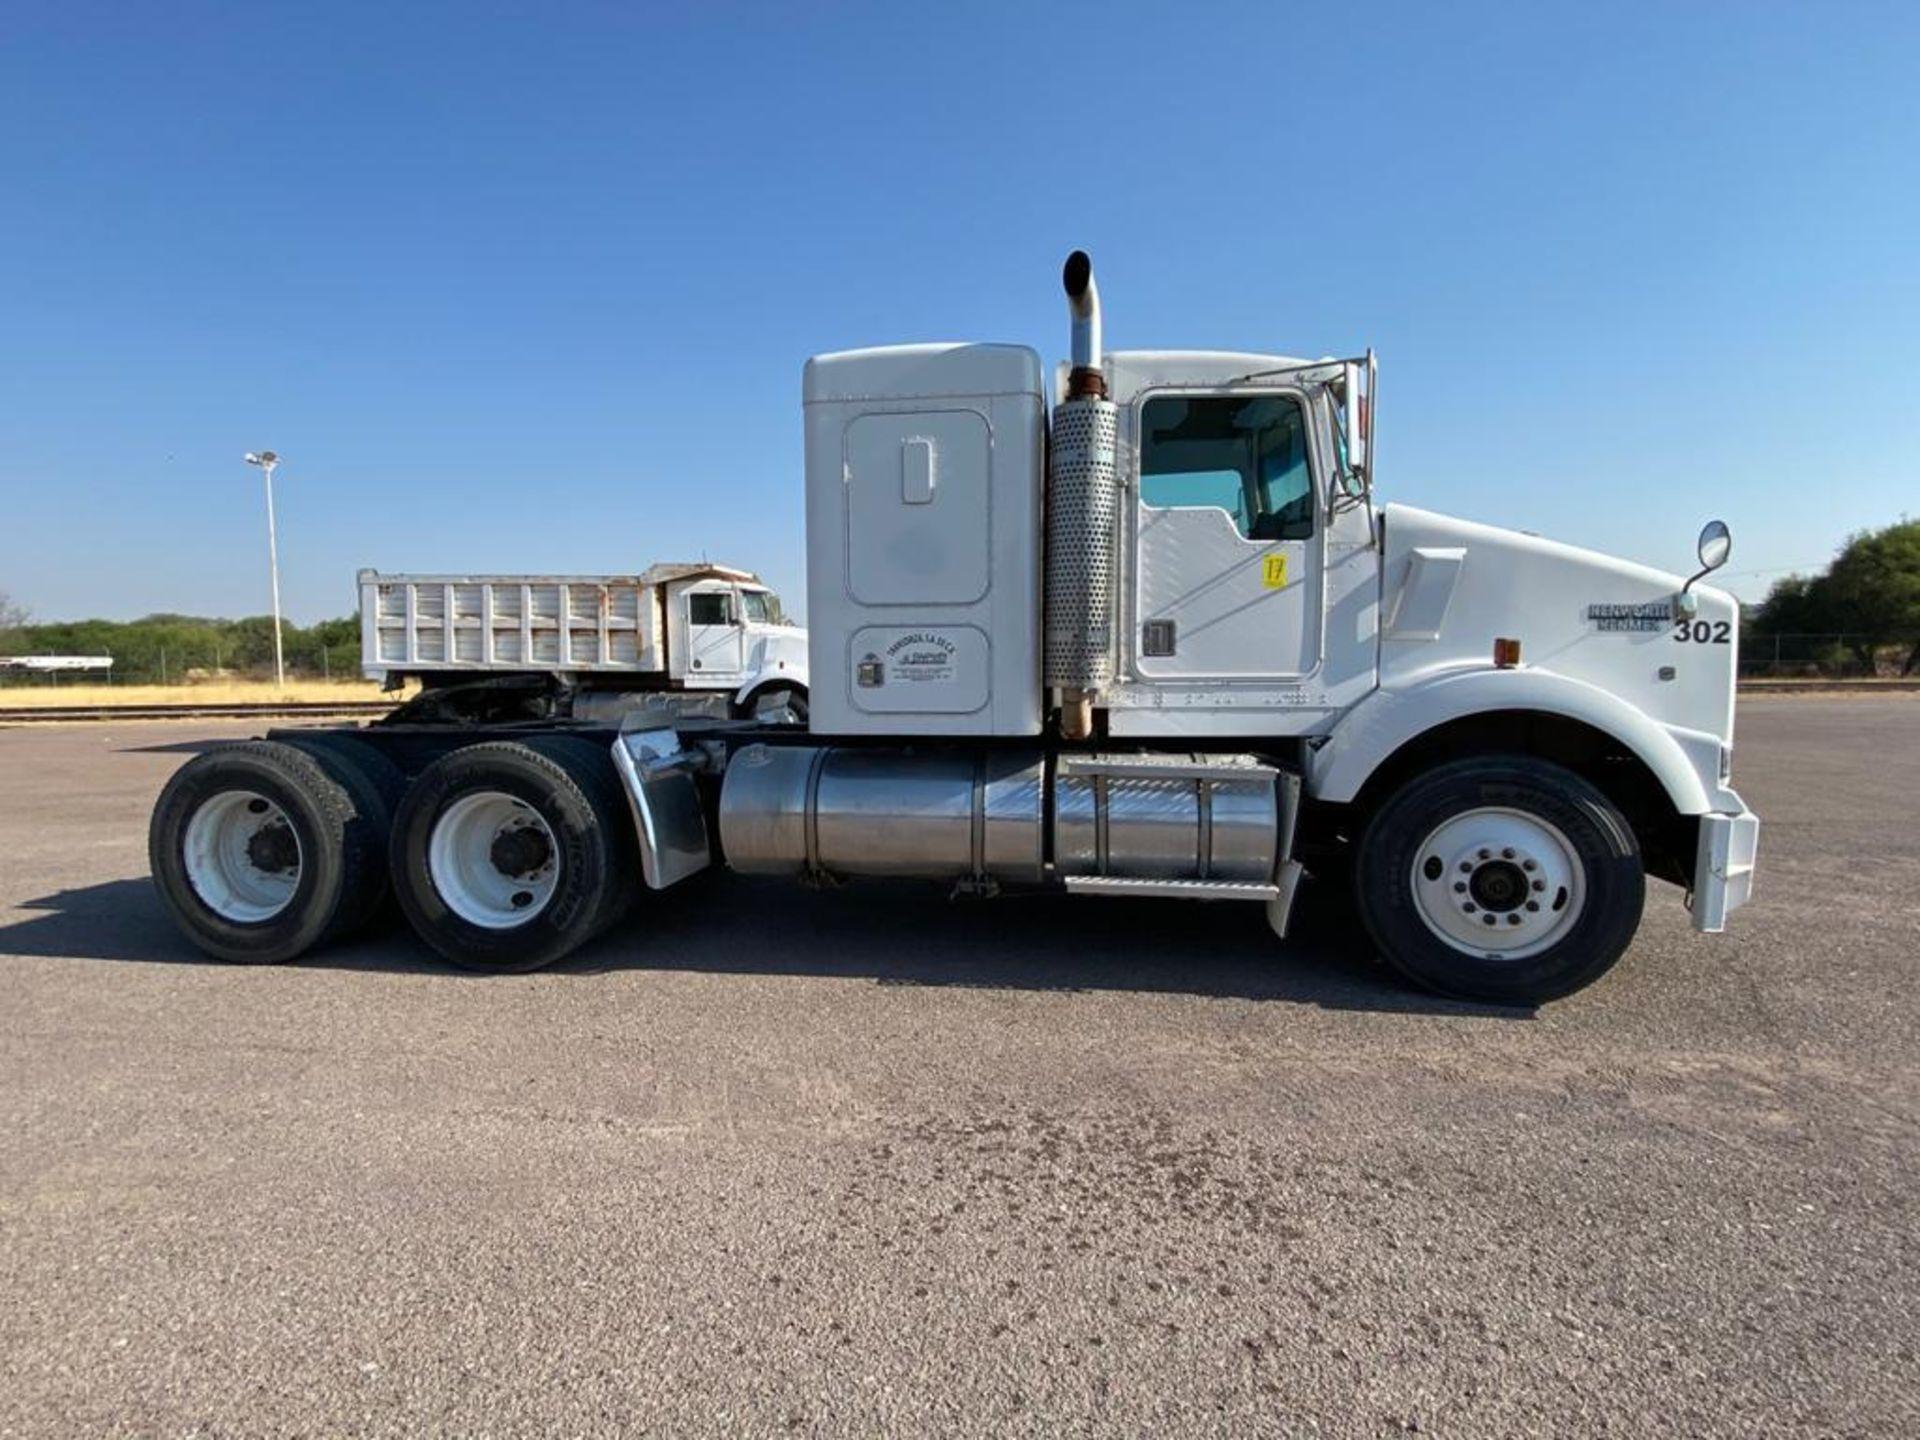 1998 Kenworth Sleeper Truck Tractor, standard transmission of 18 speeds - Image 17 of 55